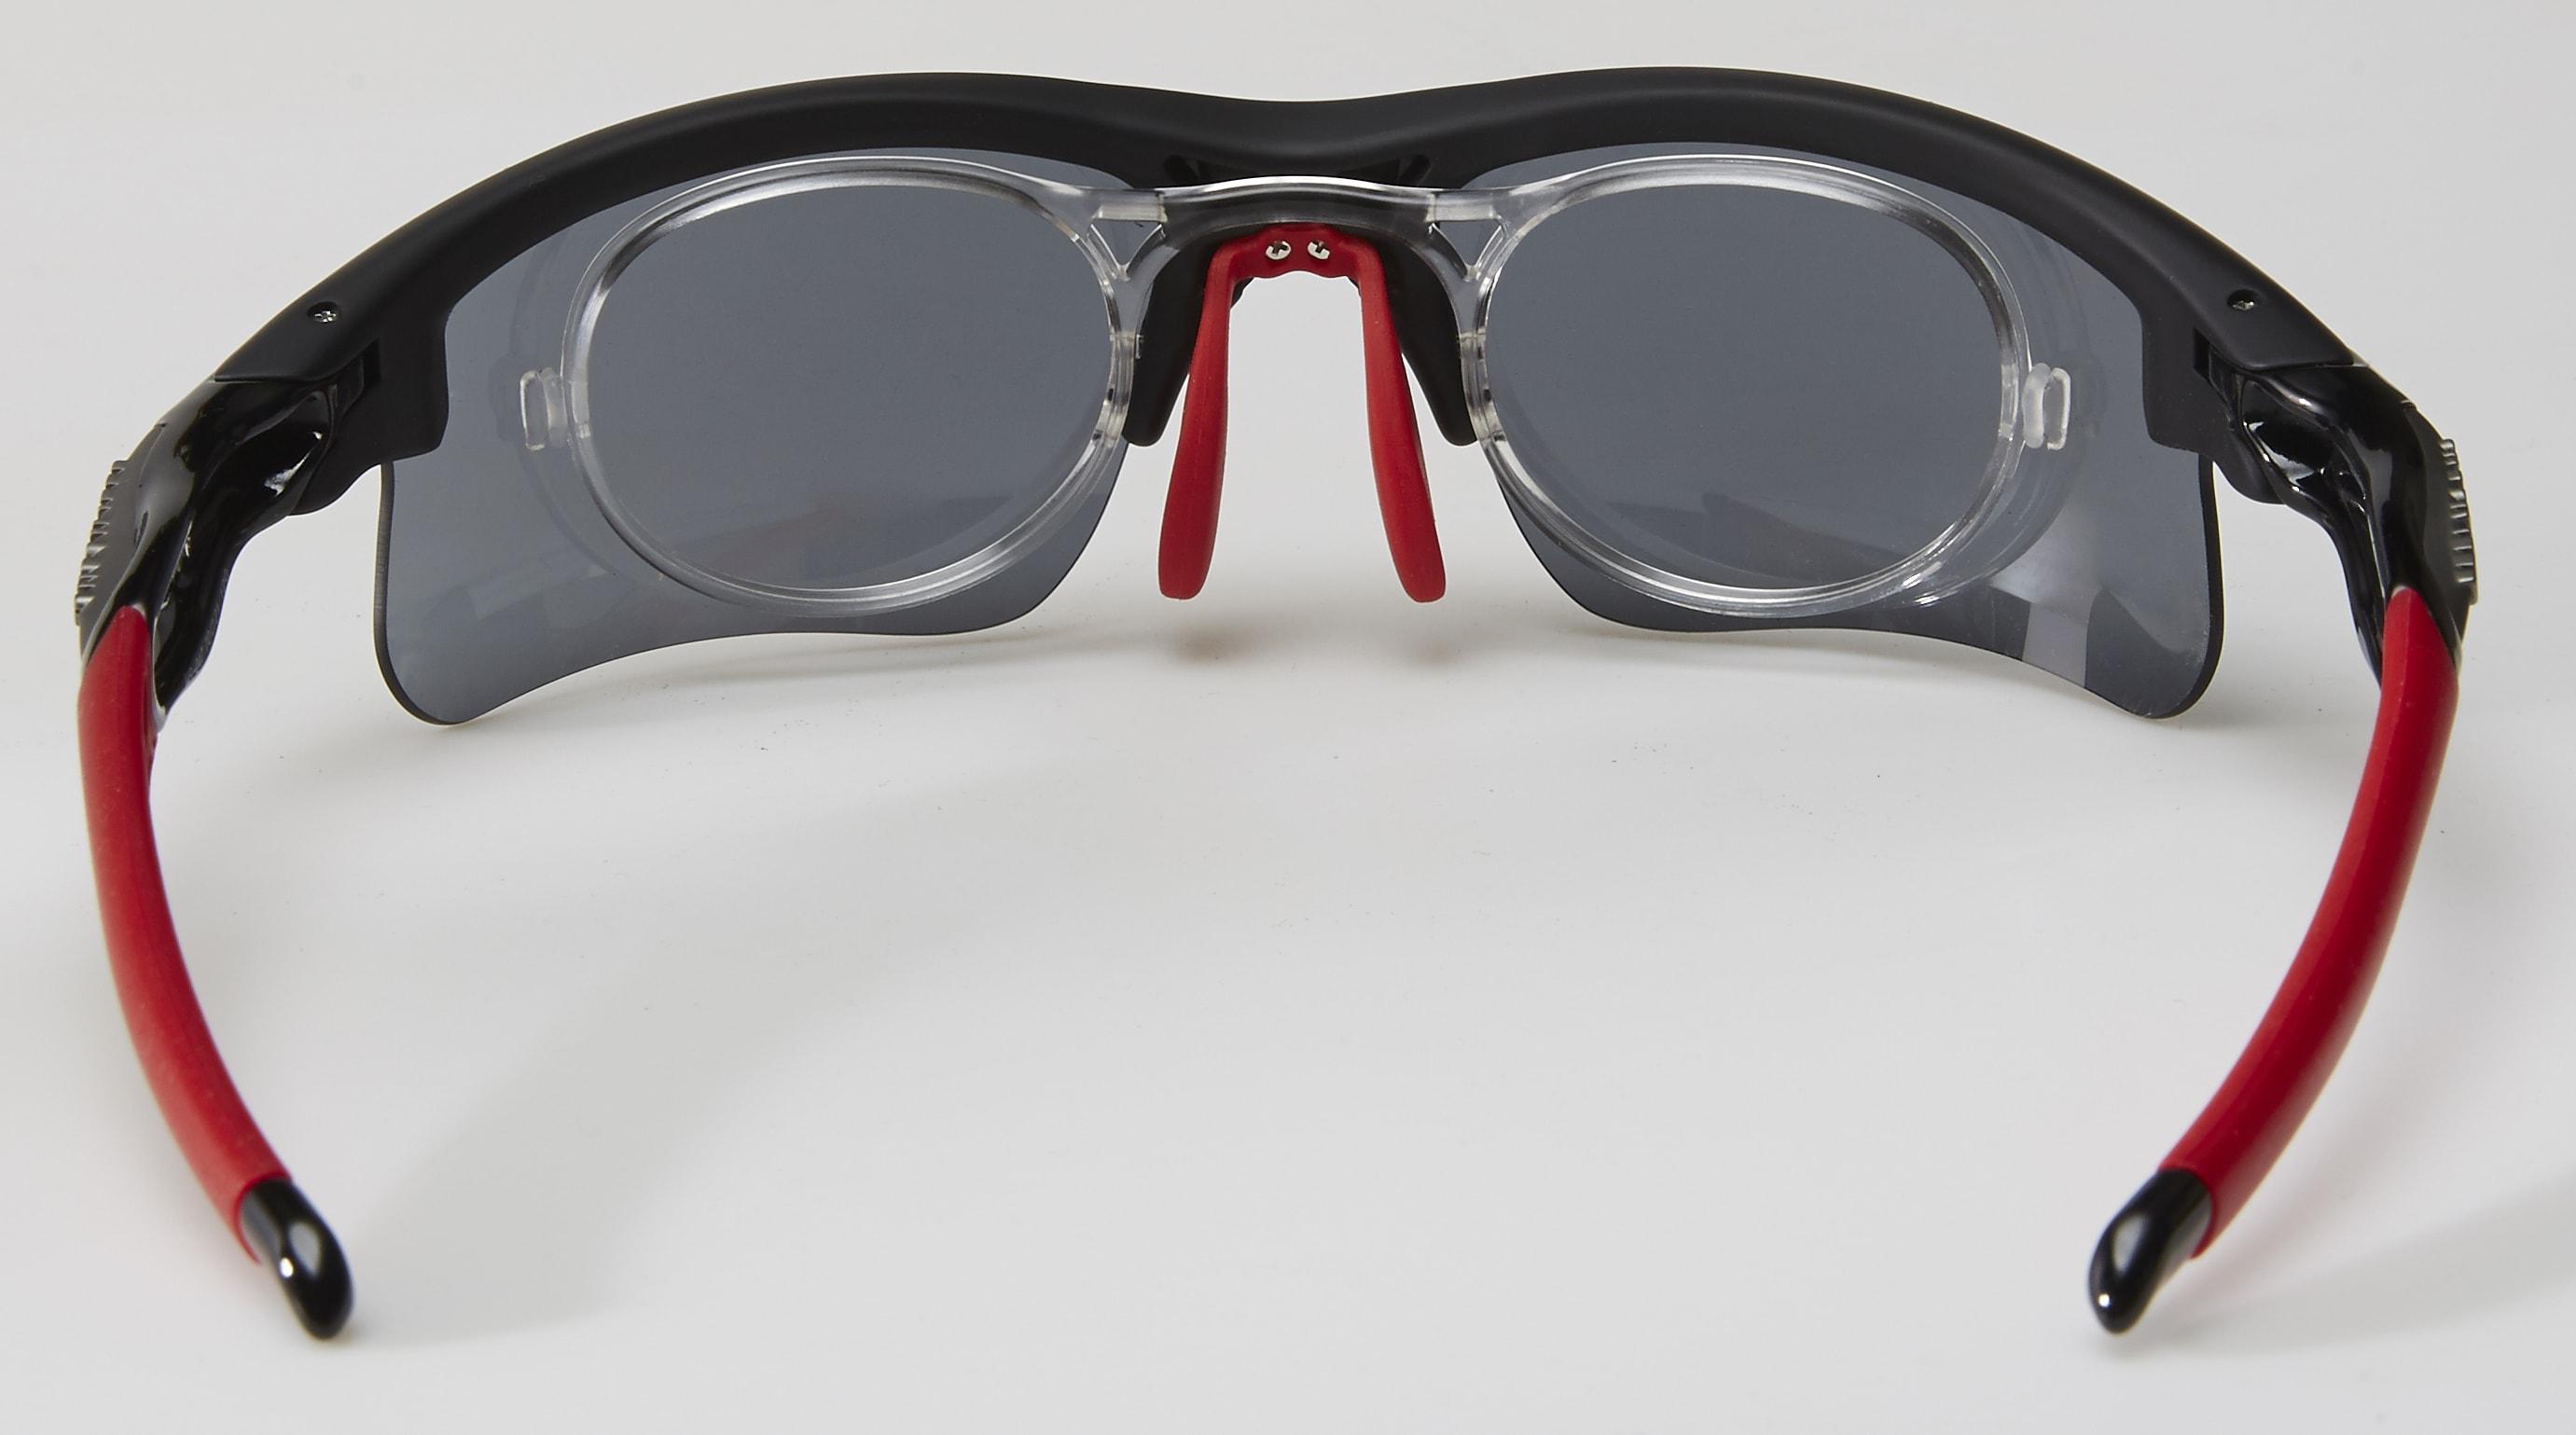 clip optico feel morys ms-047 negra roja